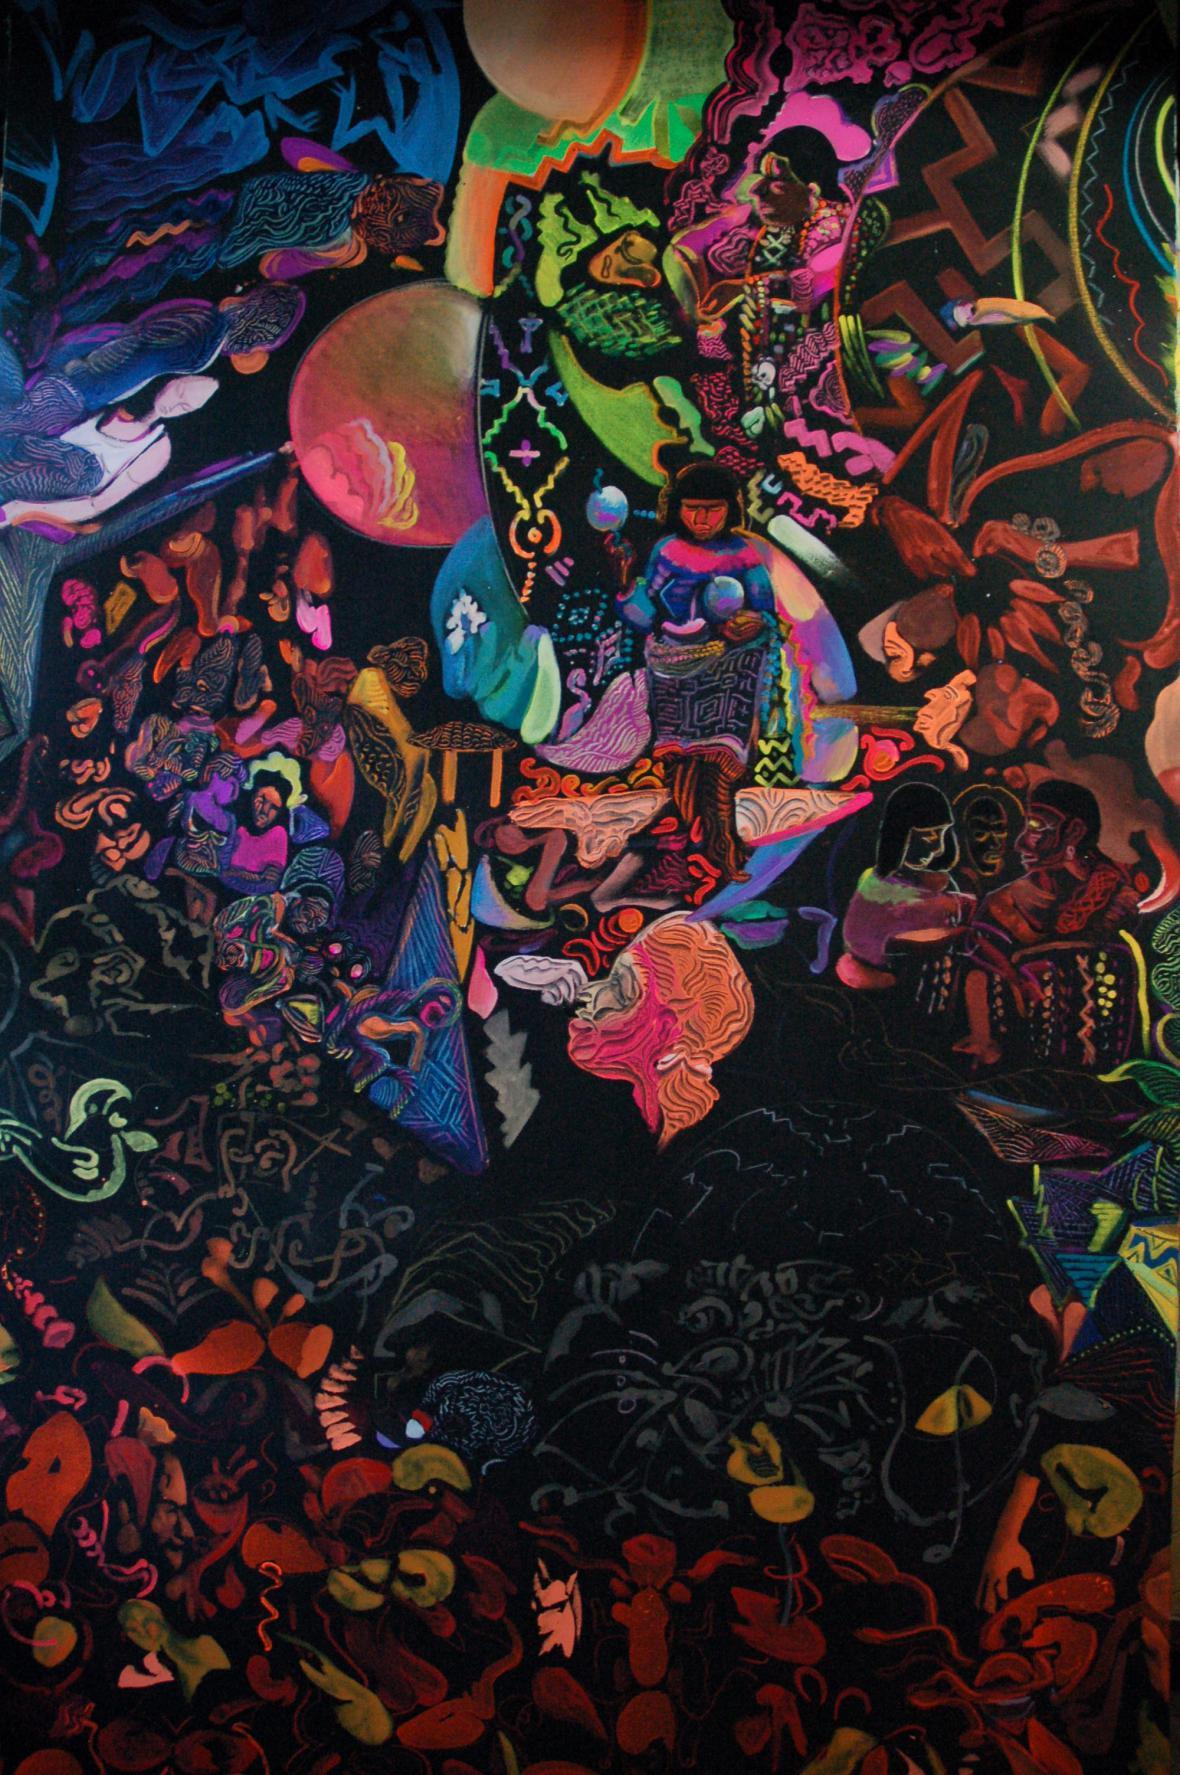 Otto Placht / Triptych Fascinativos